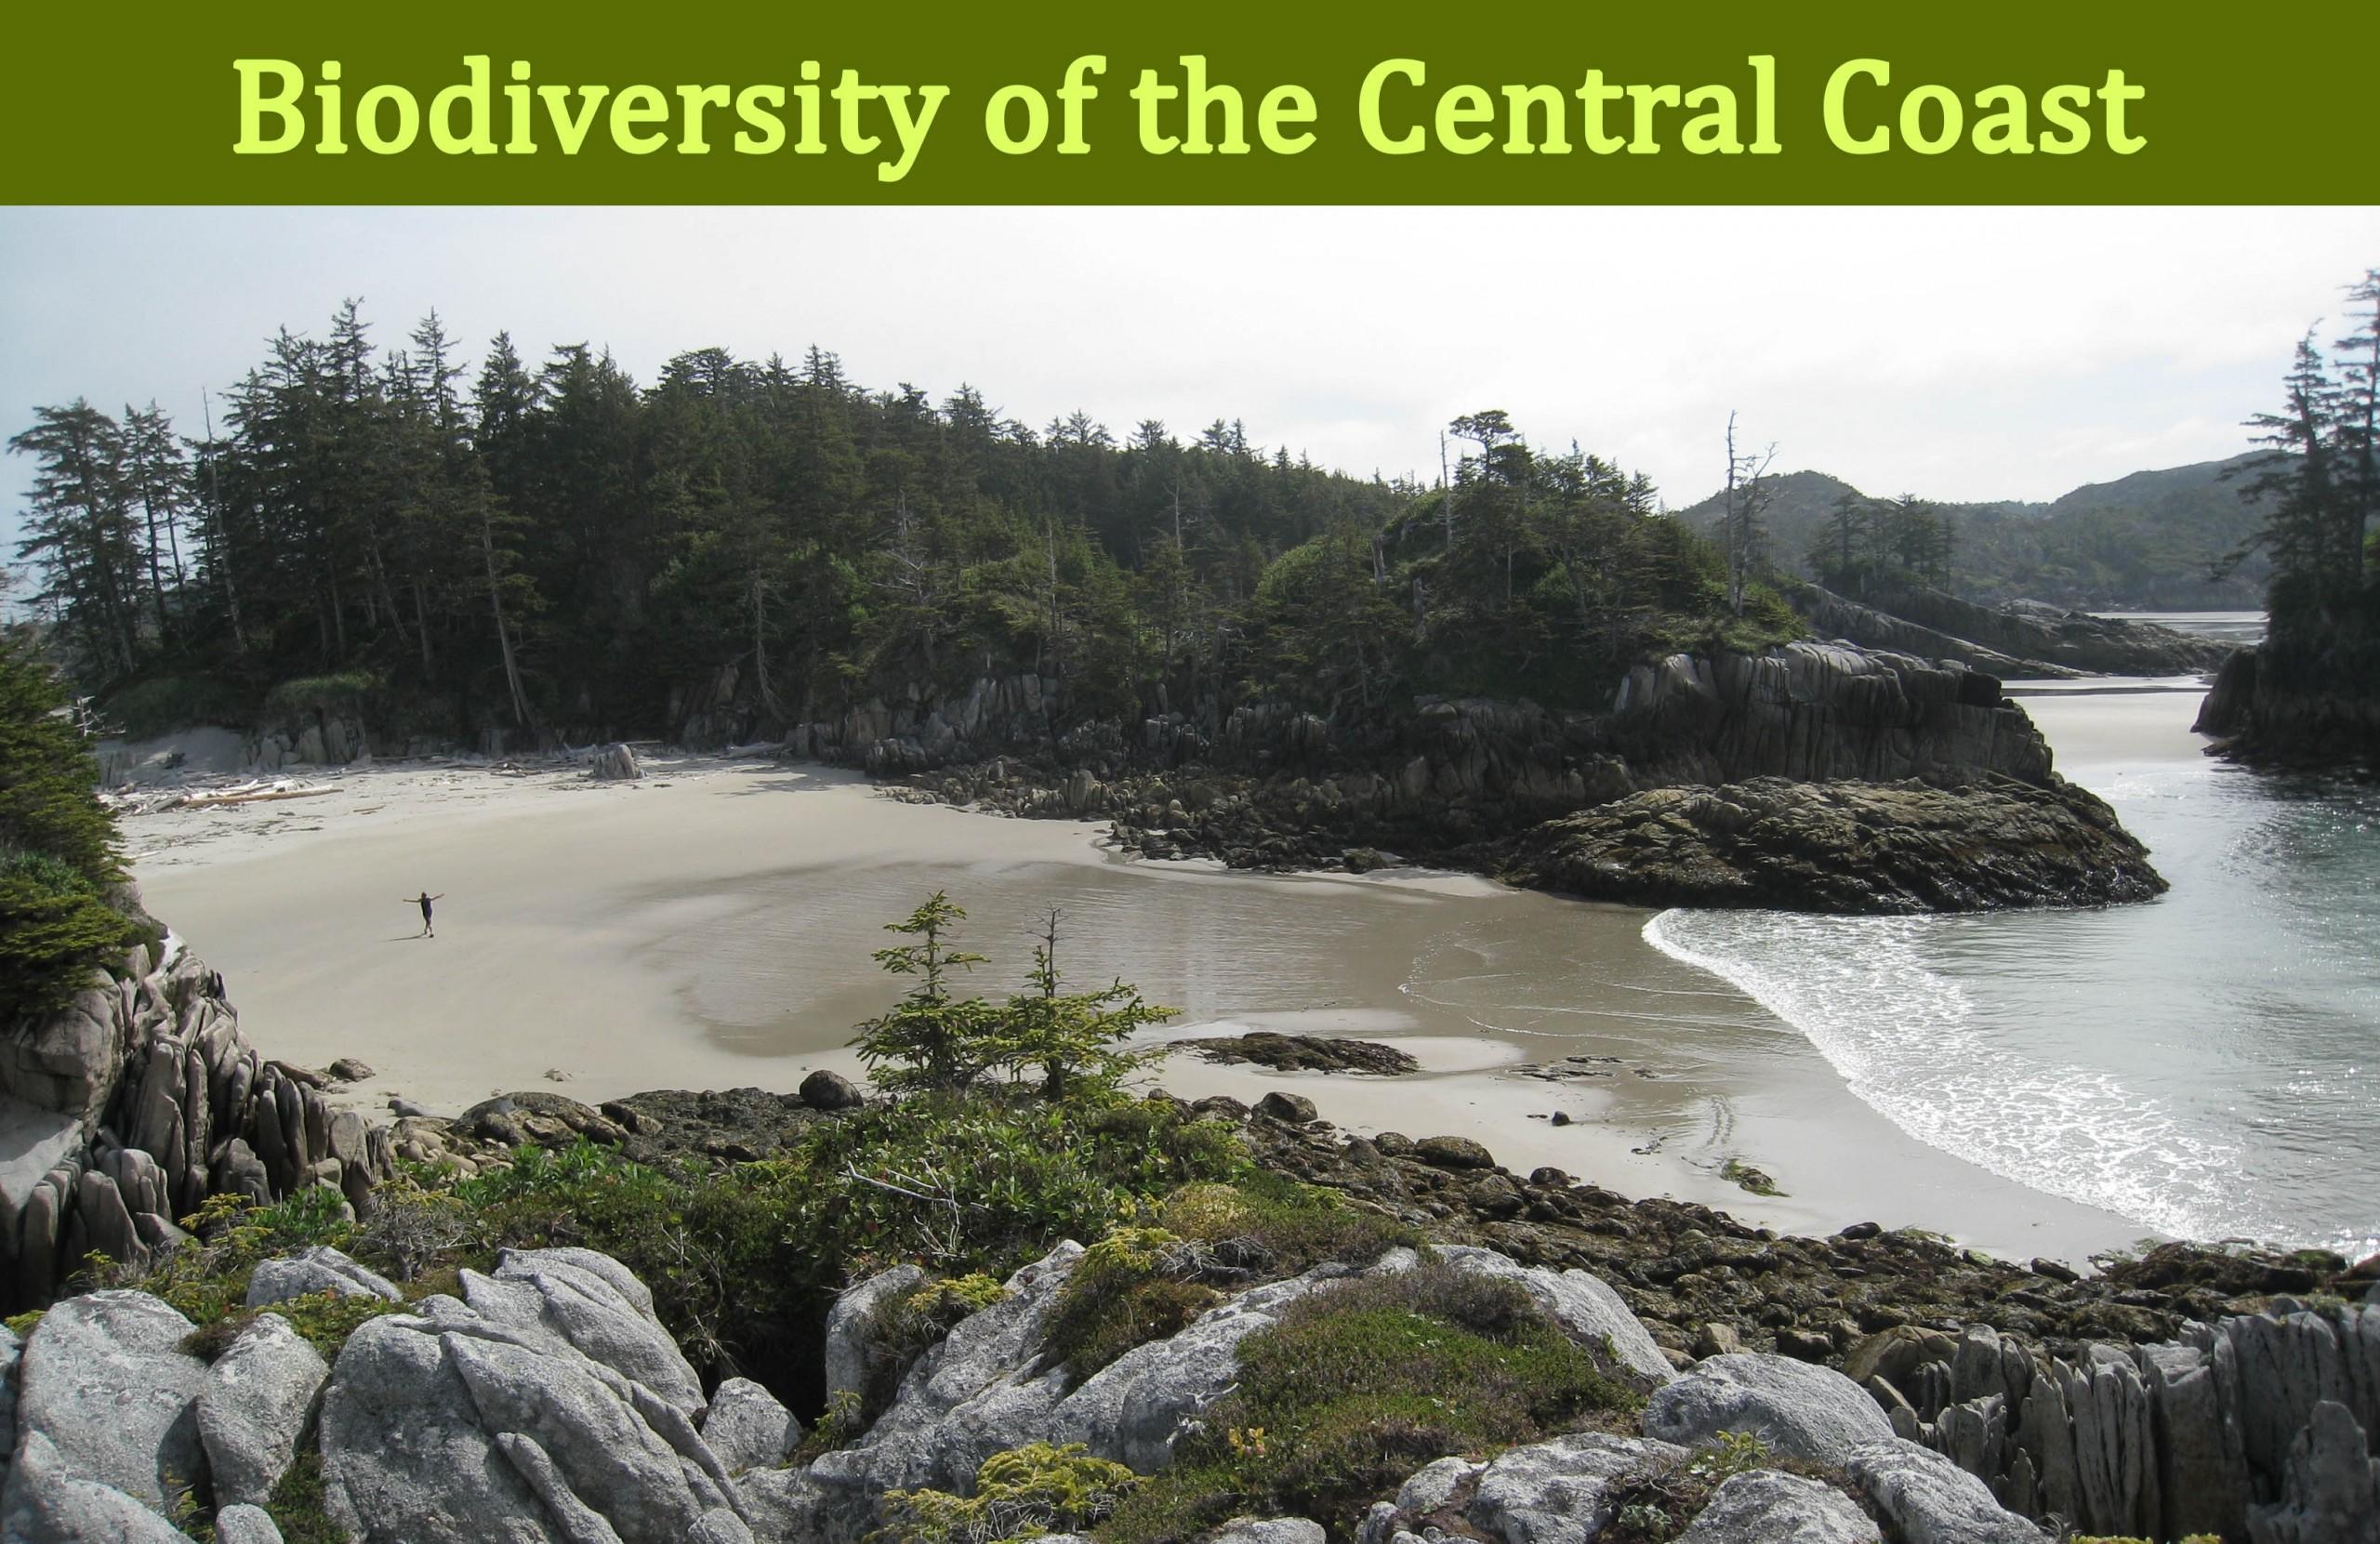 The Central Coast Biodiversity app is FANTASTIC